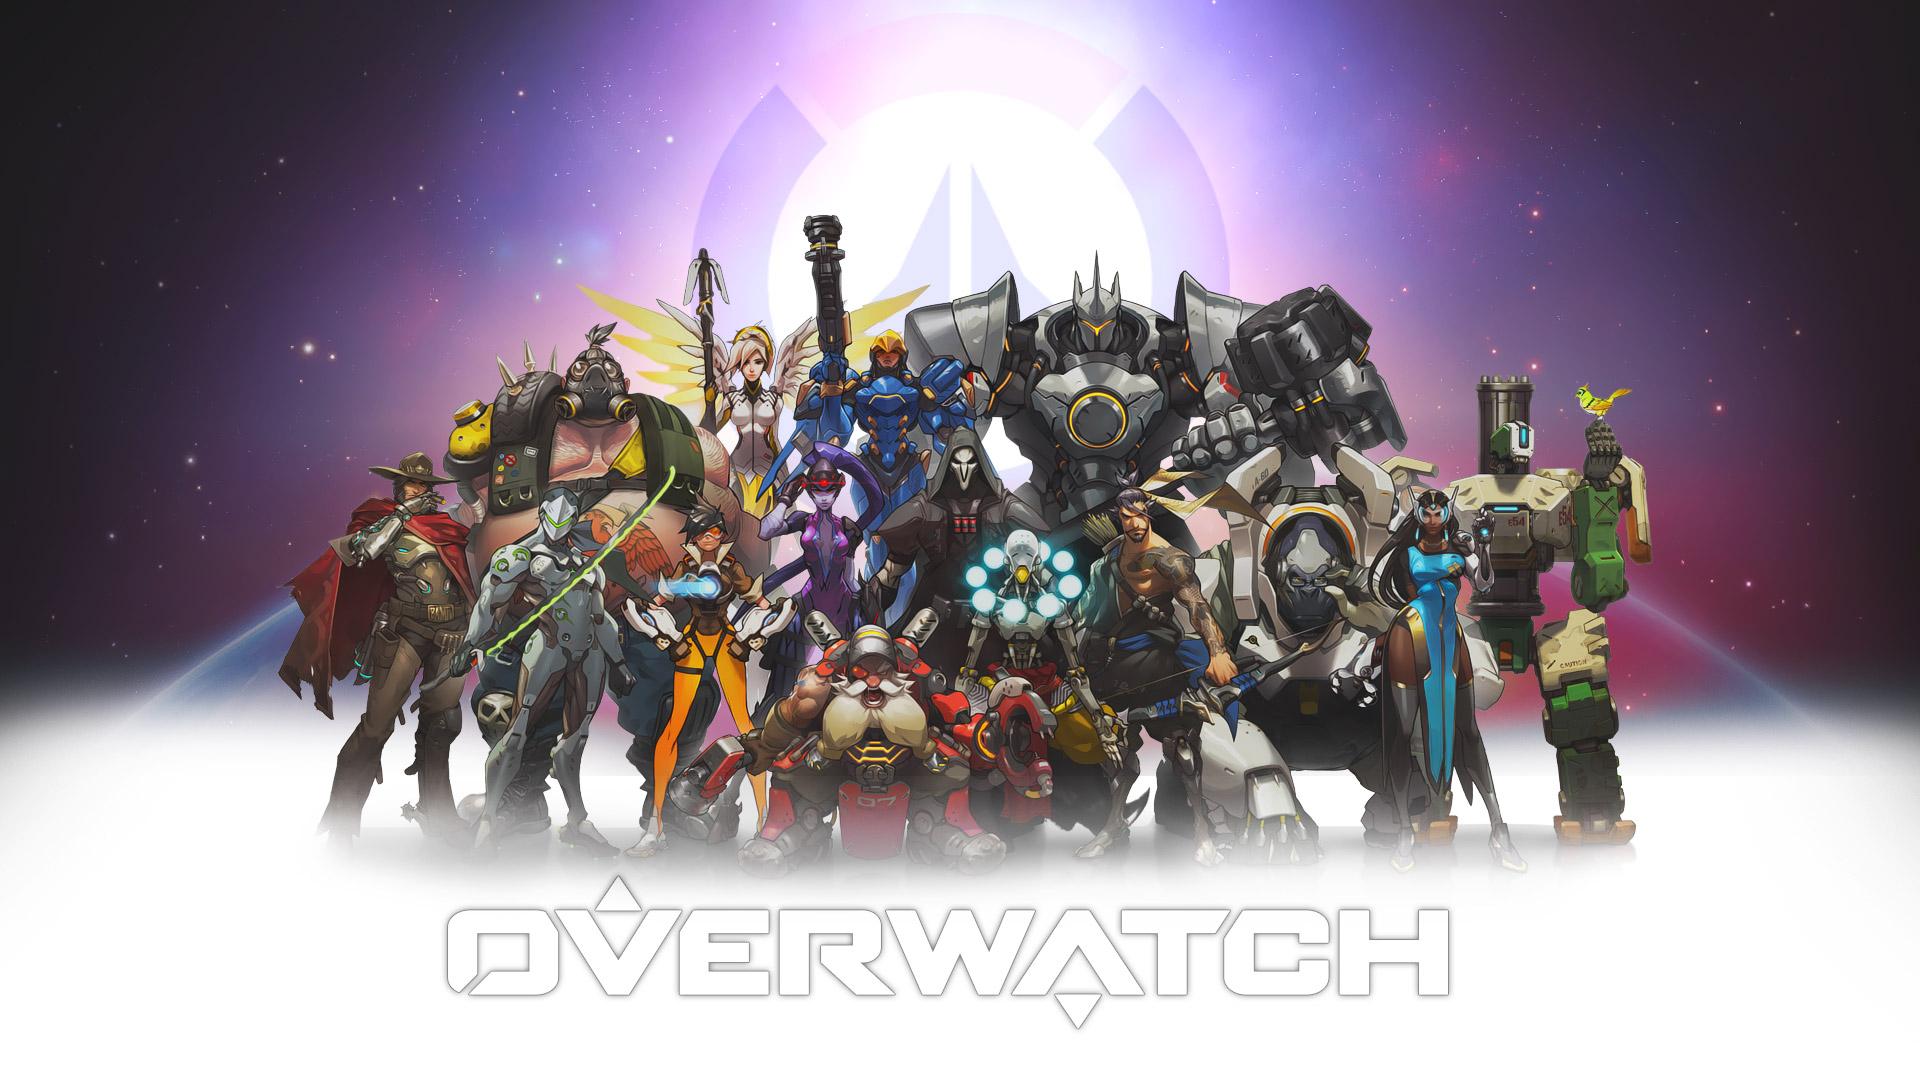 Download Wallpapers Overwatch Characters Wallpaper 1920x1080 46